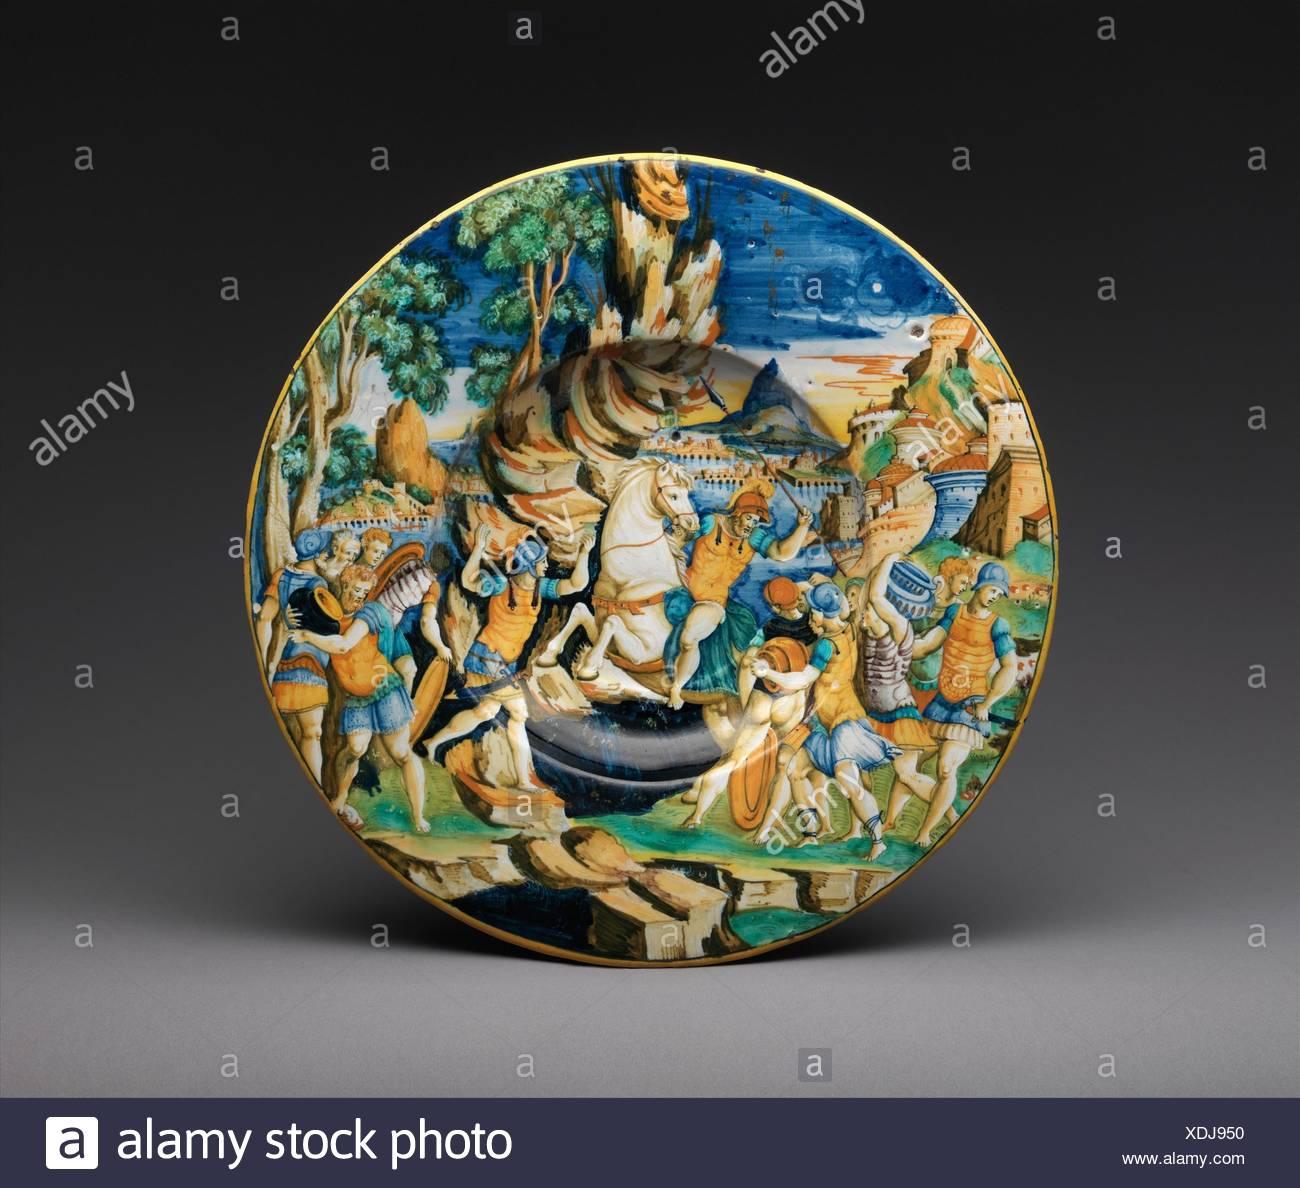 Dish with The Heroism of Marcus Curtius. Maker: Workshop of Guido de Merlino (Italian, active ca. 1523-58); Date: 1542; Culture: Italian, Urbino; - Stock Image